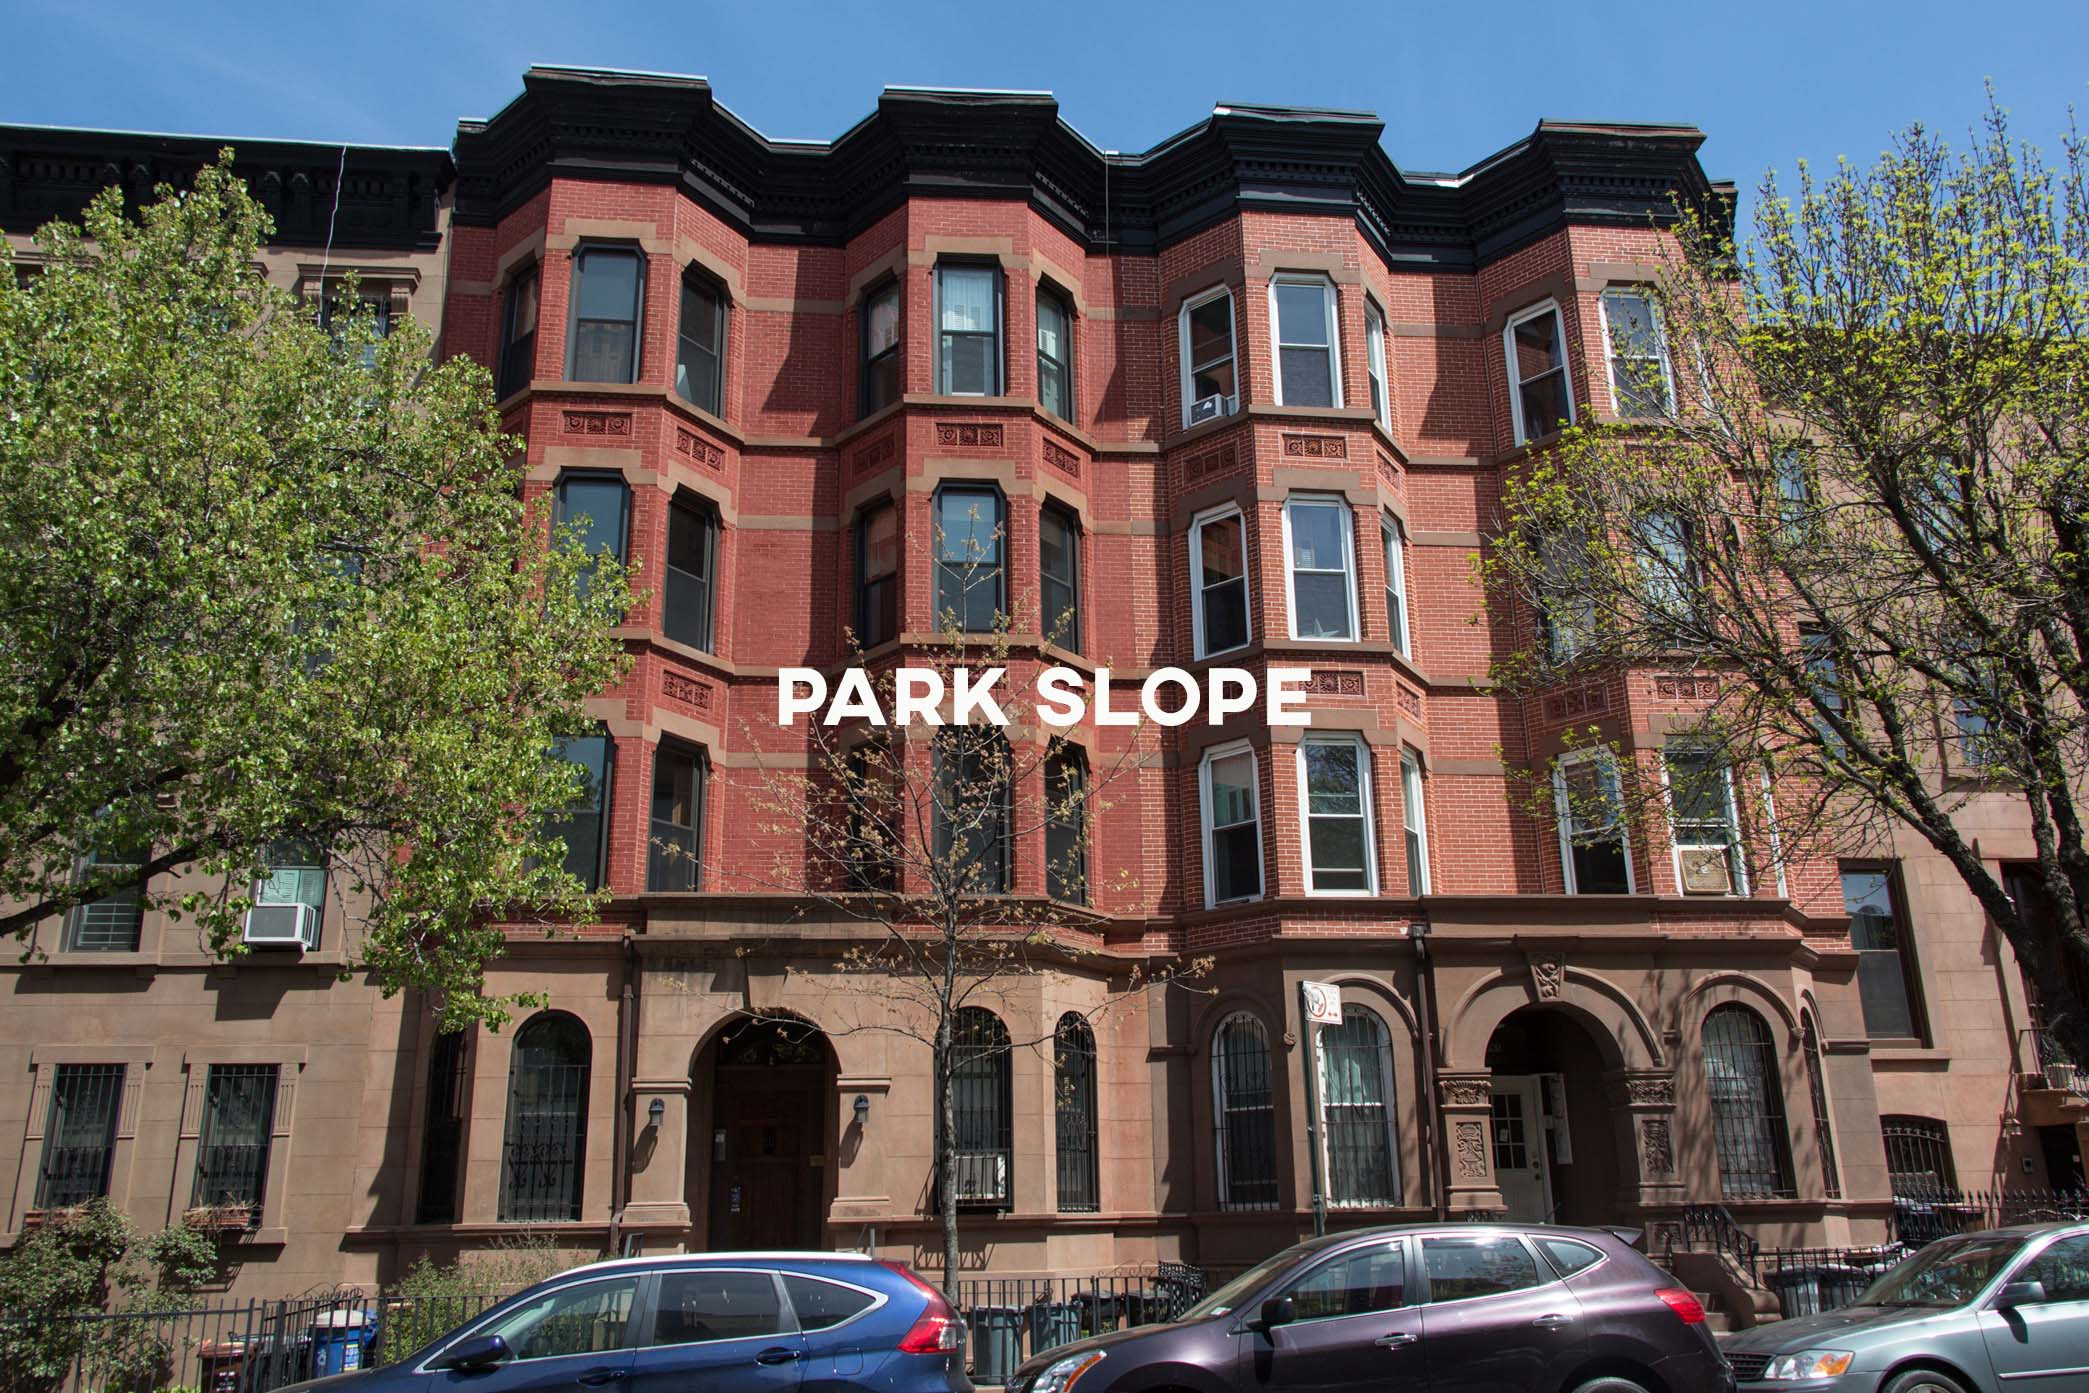 Park Slope - Diversity, history, and great schools, create a very popular Brooklyn neighborhood